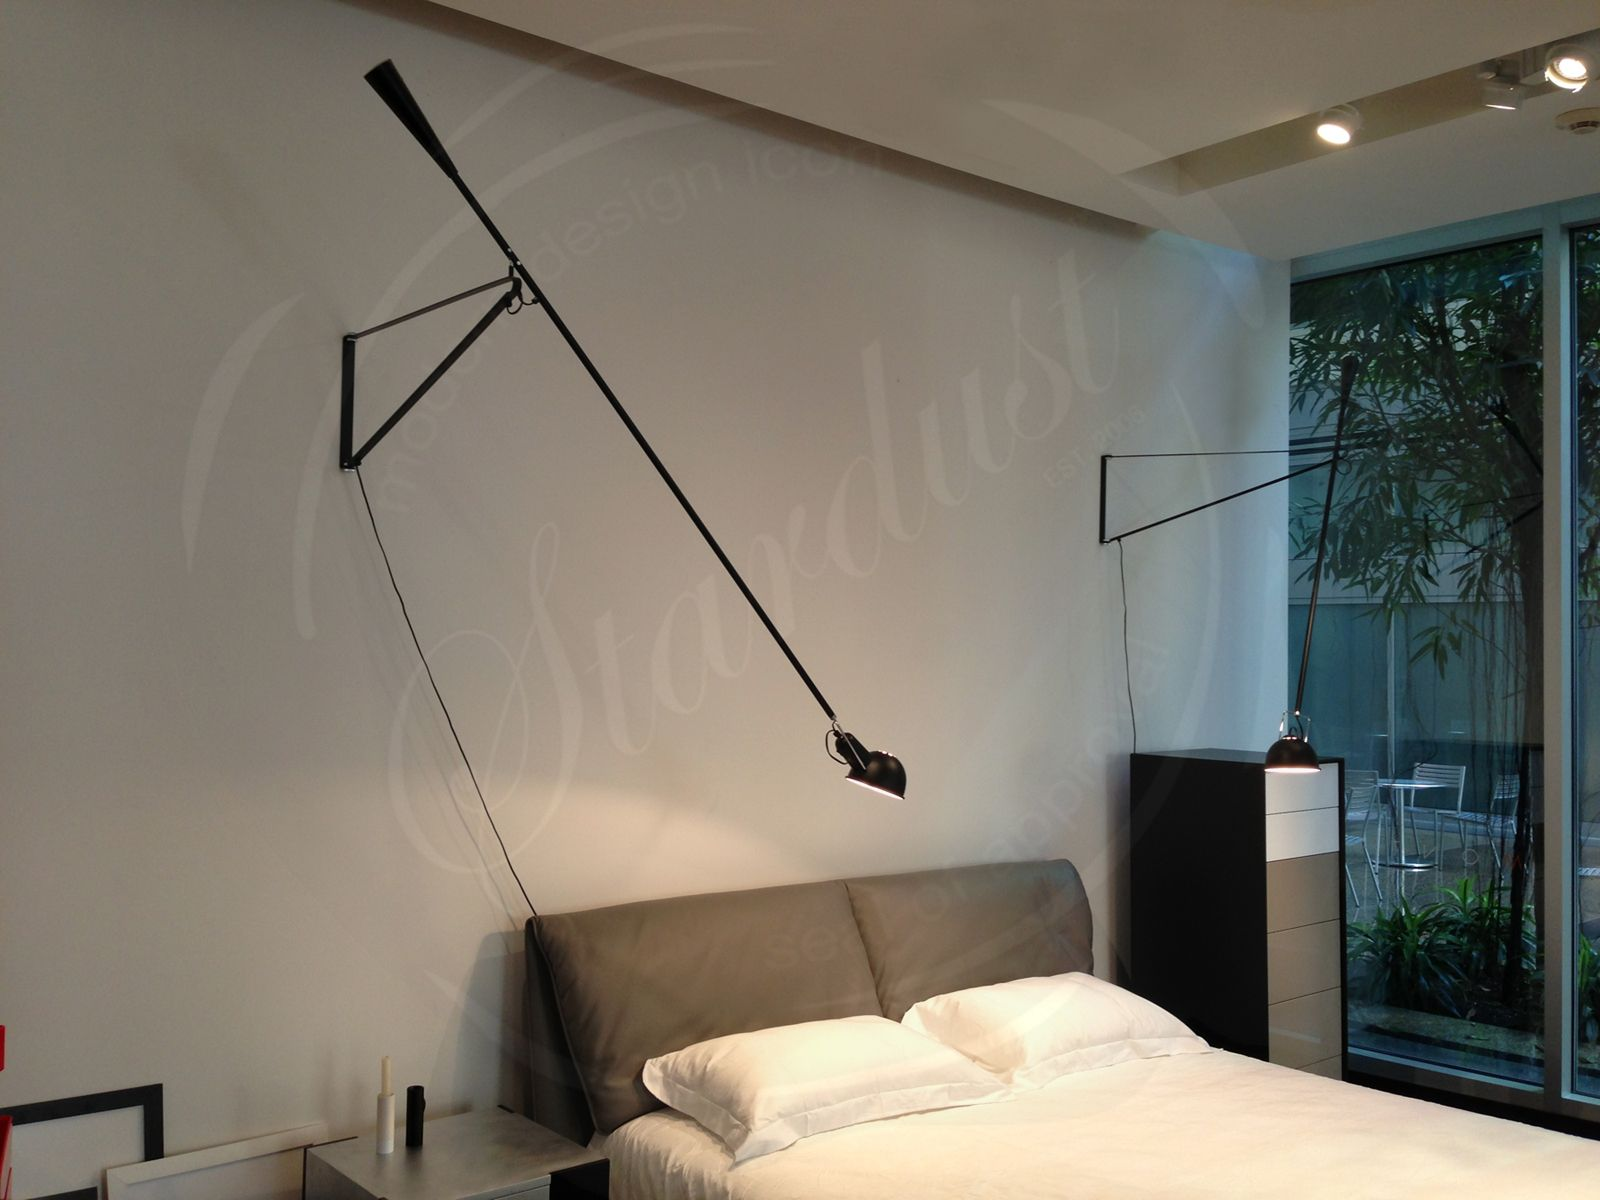 265 wall lamp from flos & flos 265 lamp modern interior design